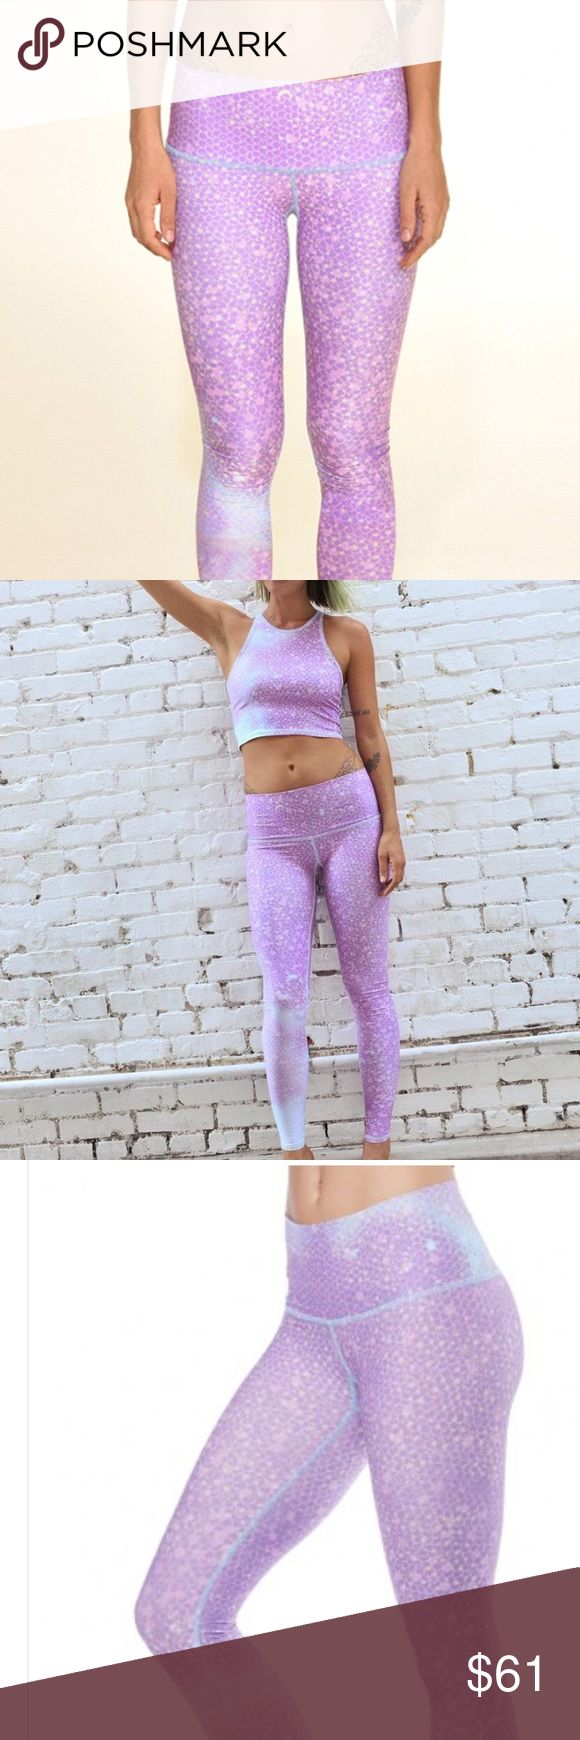 Teeki mermaid fairyqueen  lavender hot yoga pants In perfect condition. Never worn. Brand new. Size S teeki Pants Leggings